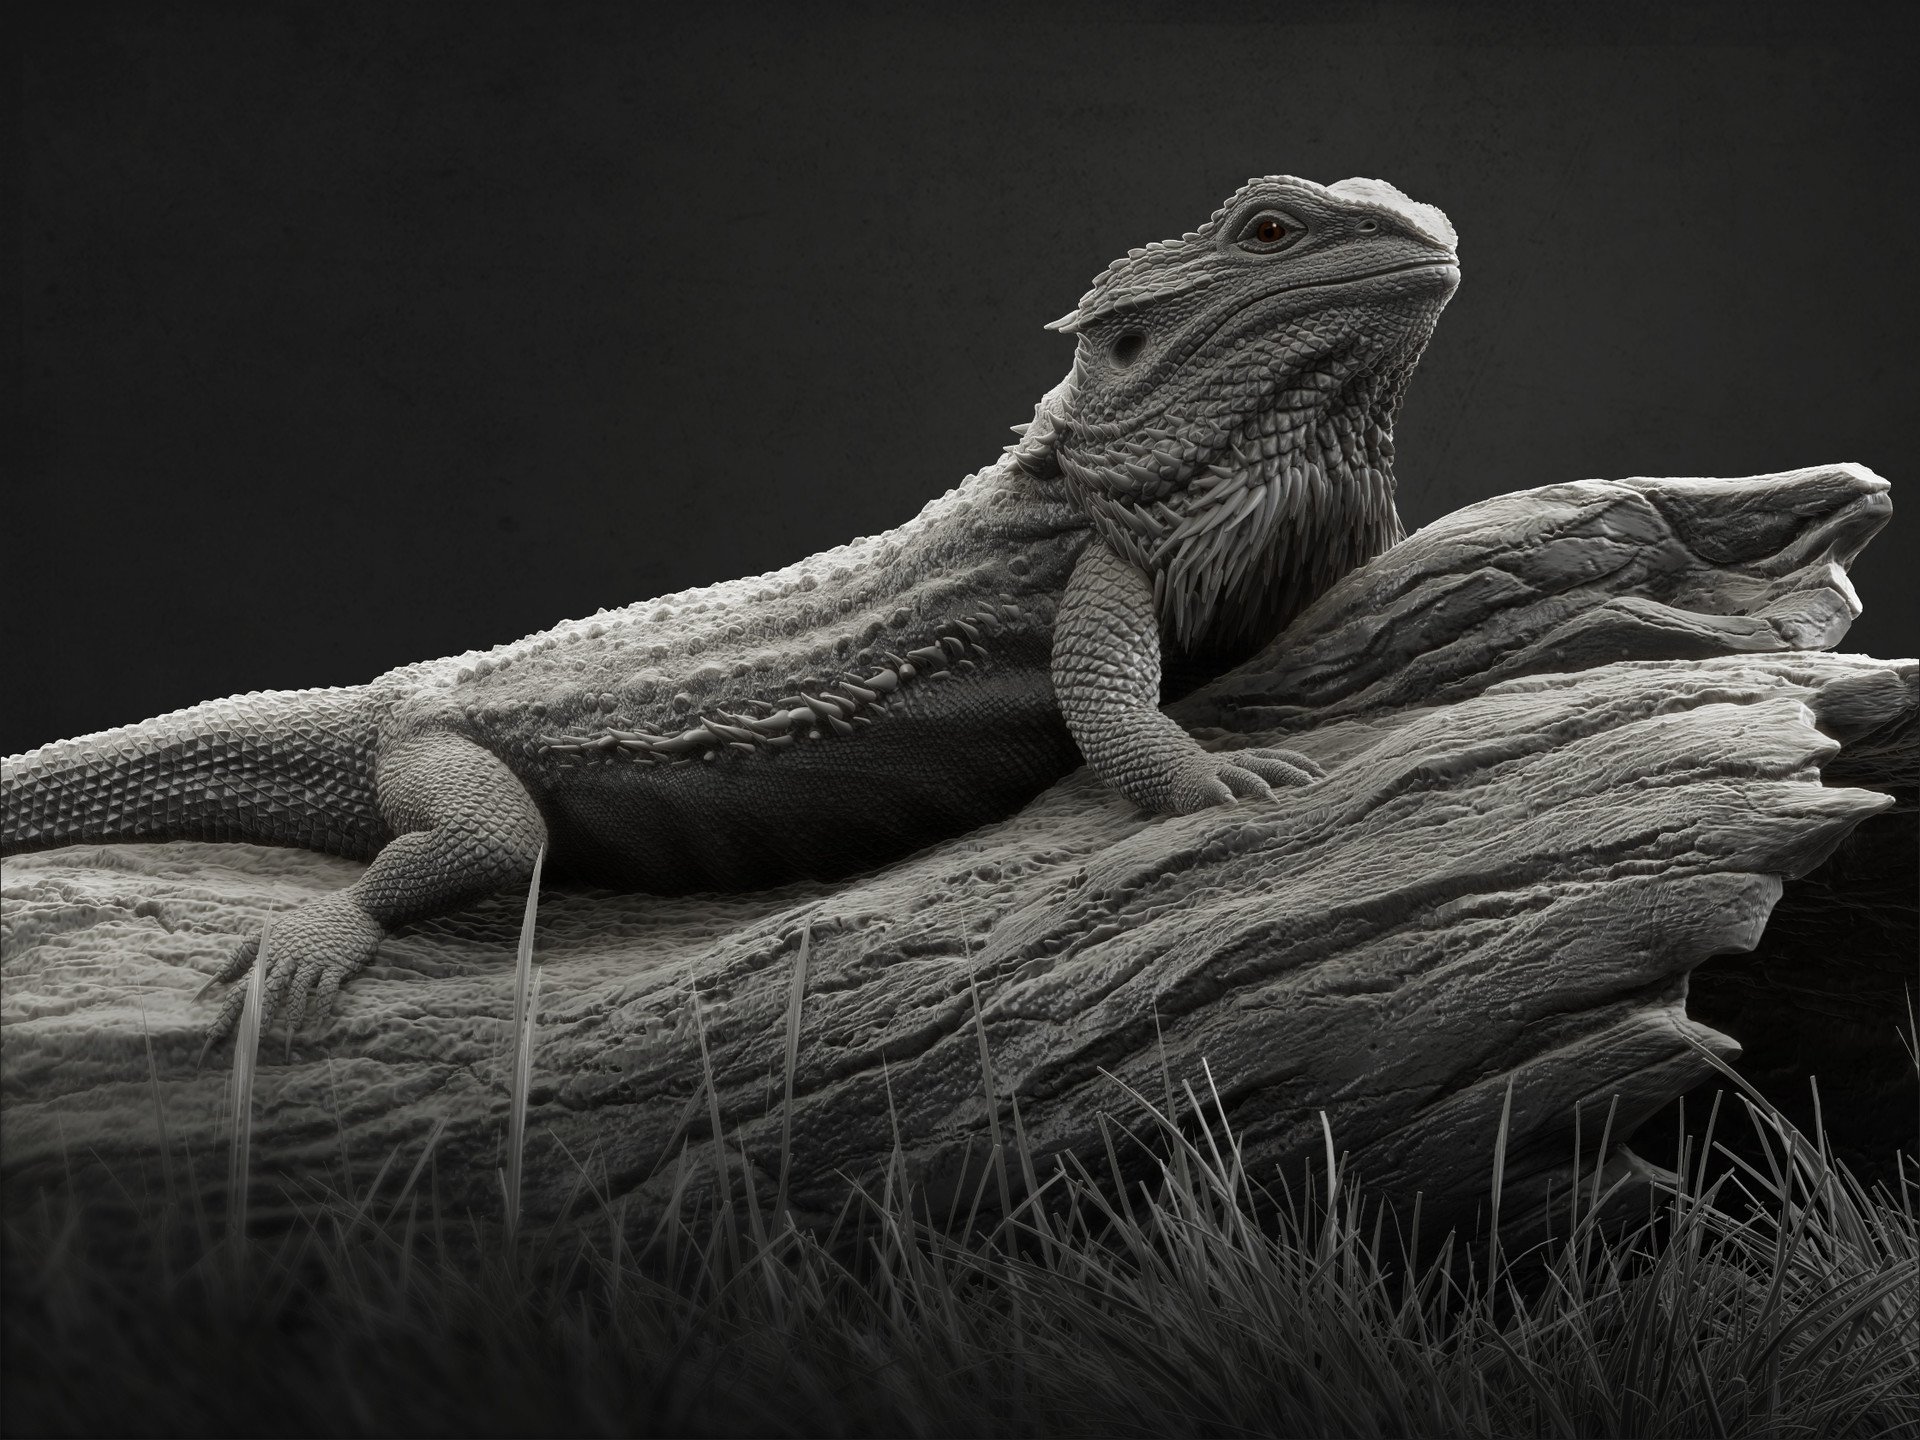 bearded lizard dragon - HD1920×1440